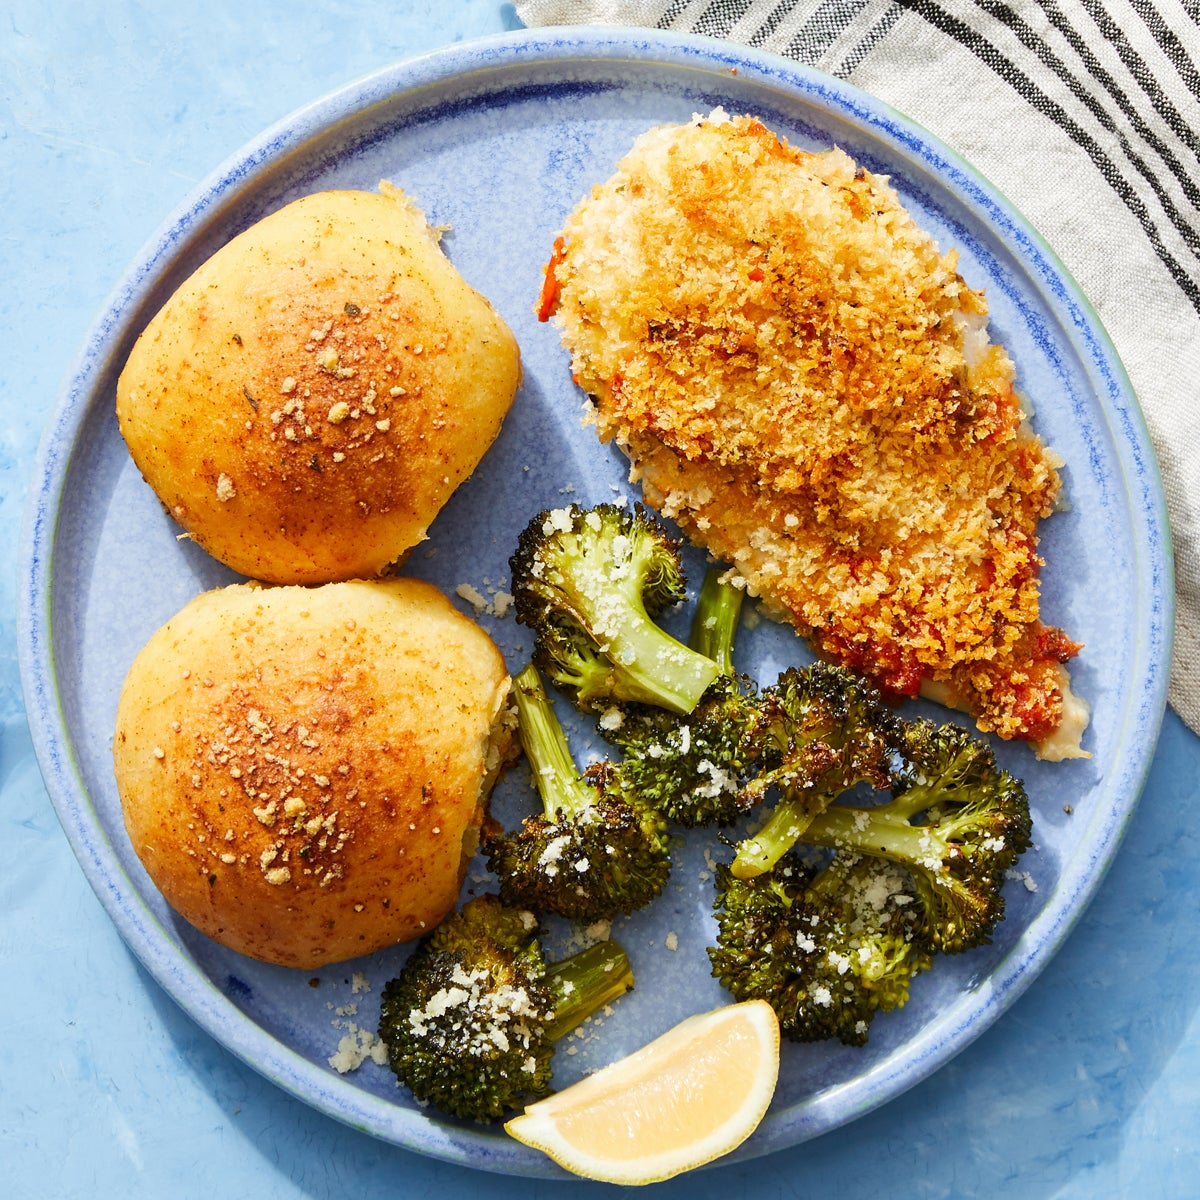 Panko & Pepper Mayo-Baked Chicken with Cheesy Stuffed Rolls & Roasted Broccoli